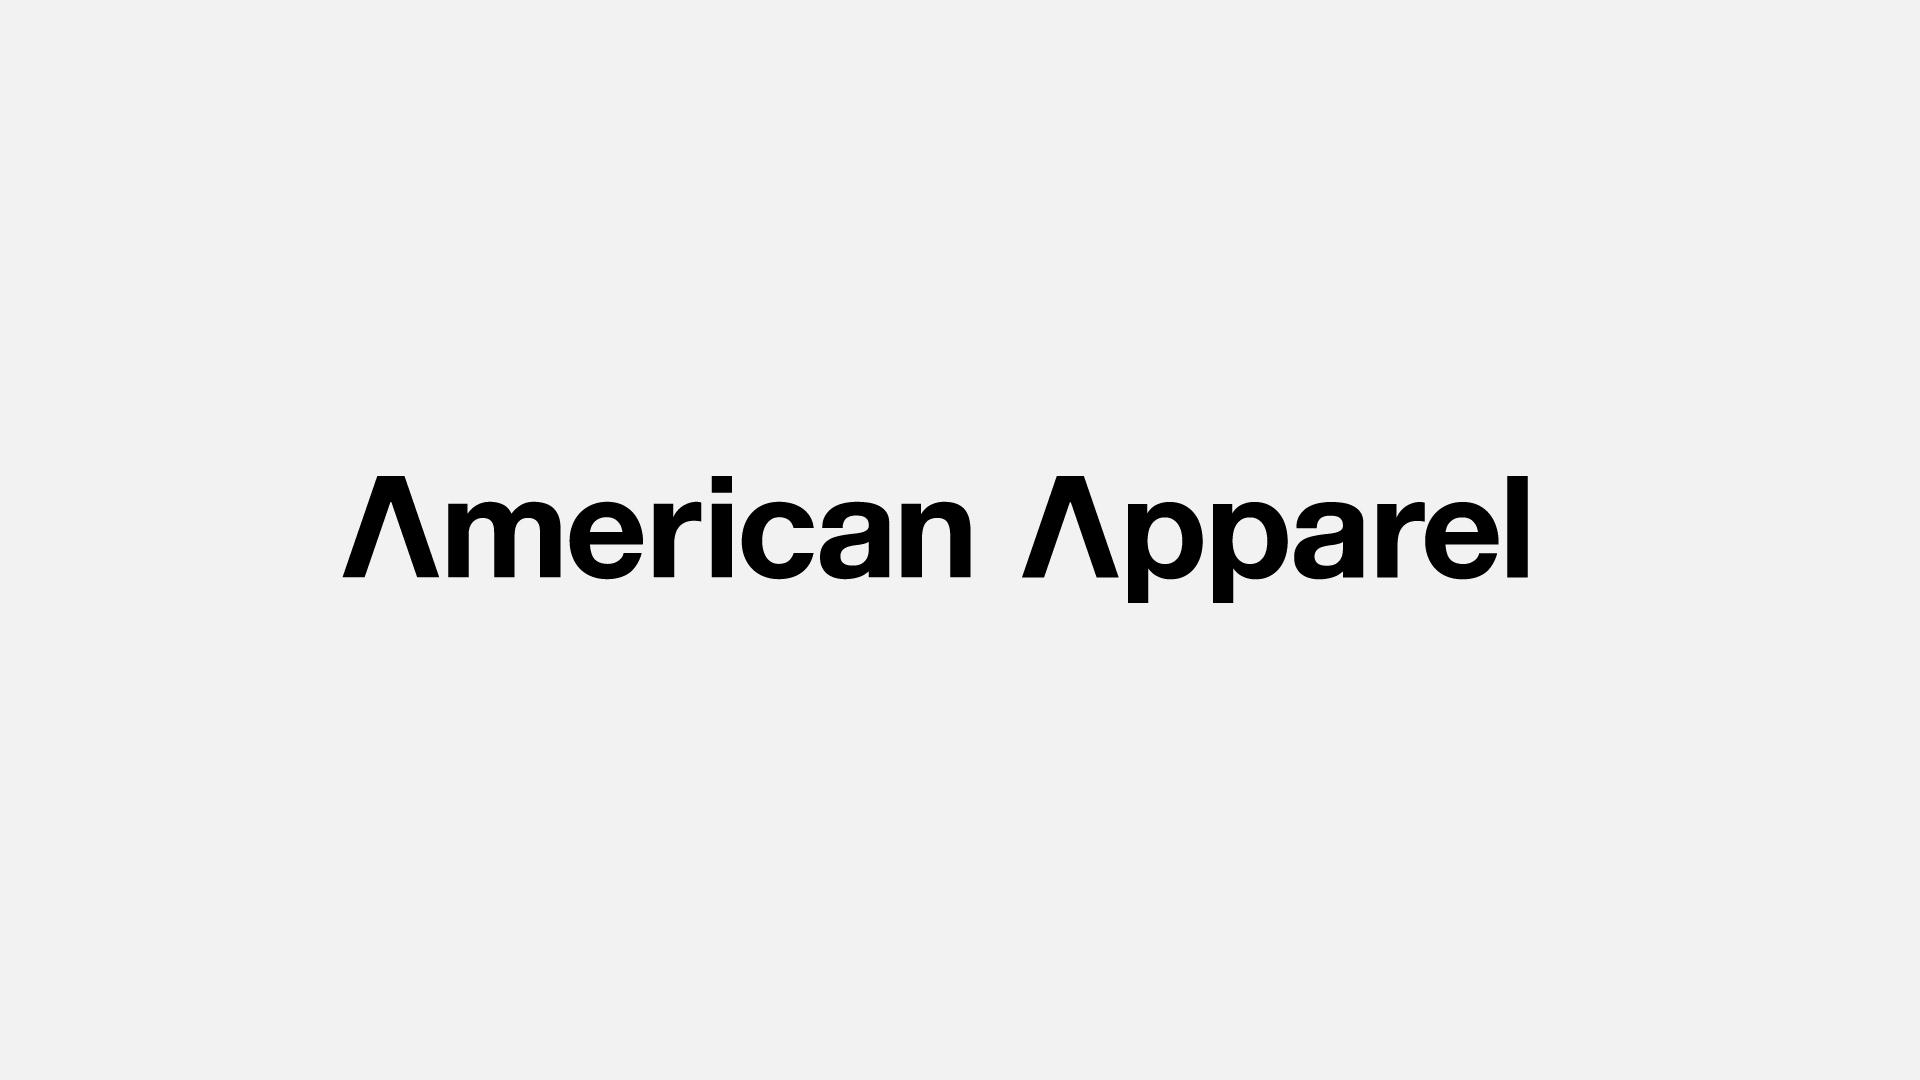 AA-logo-set-long-white.jpg